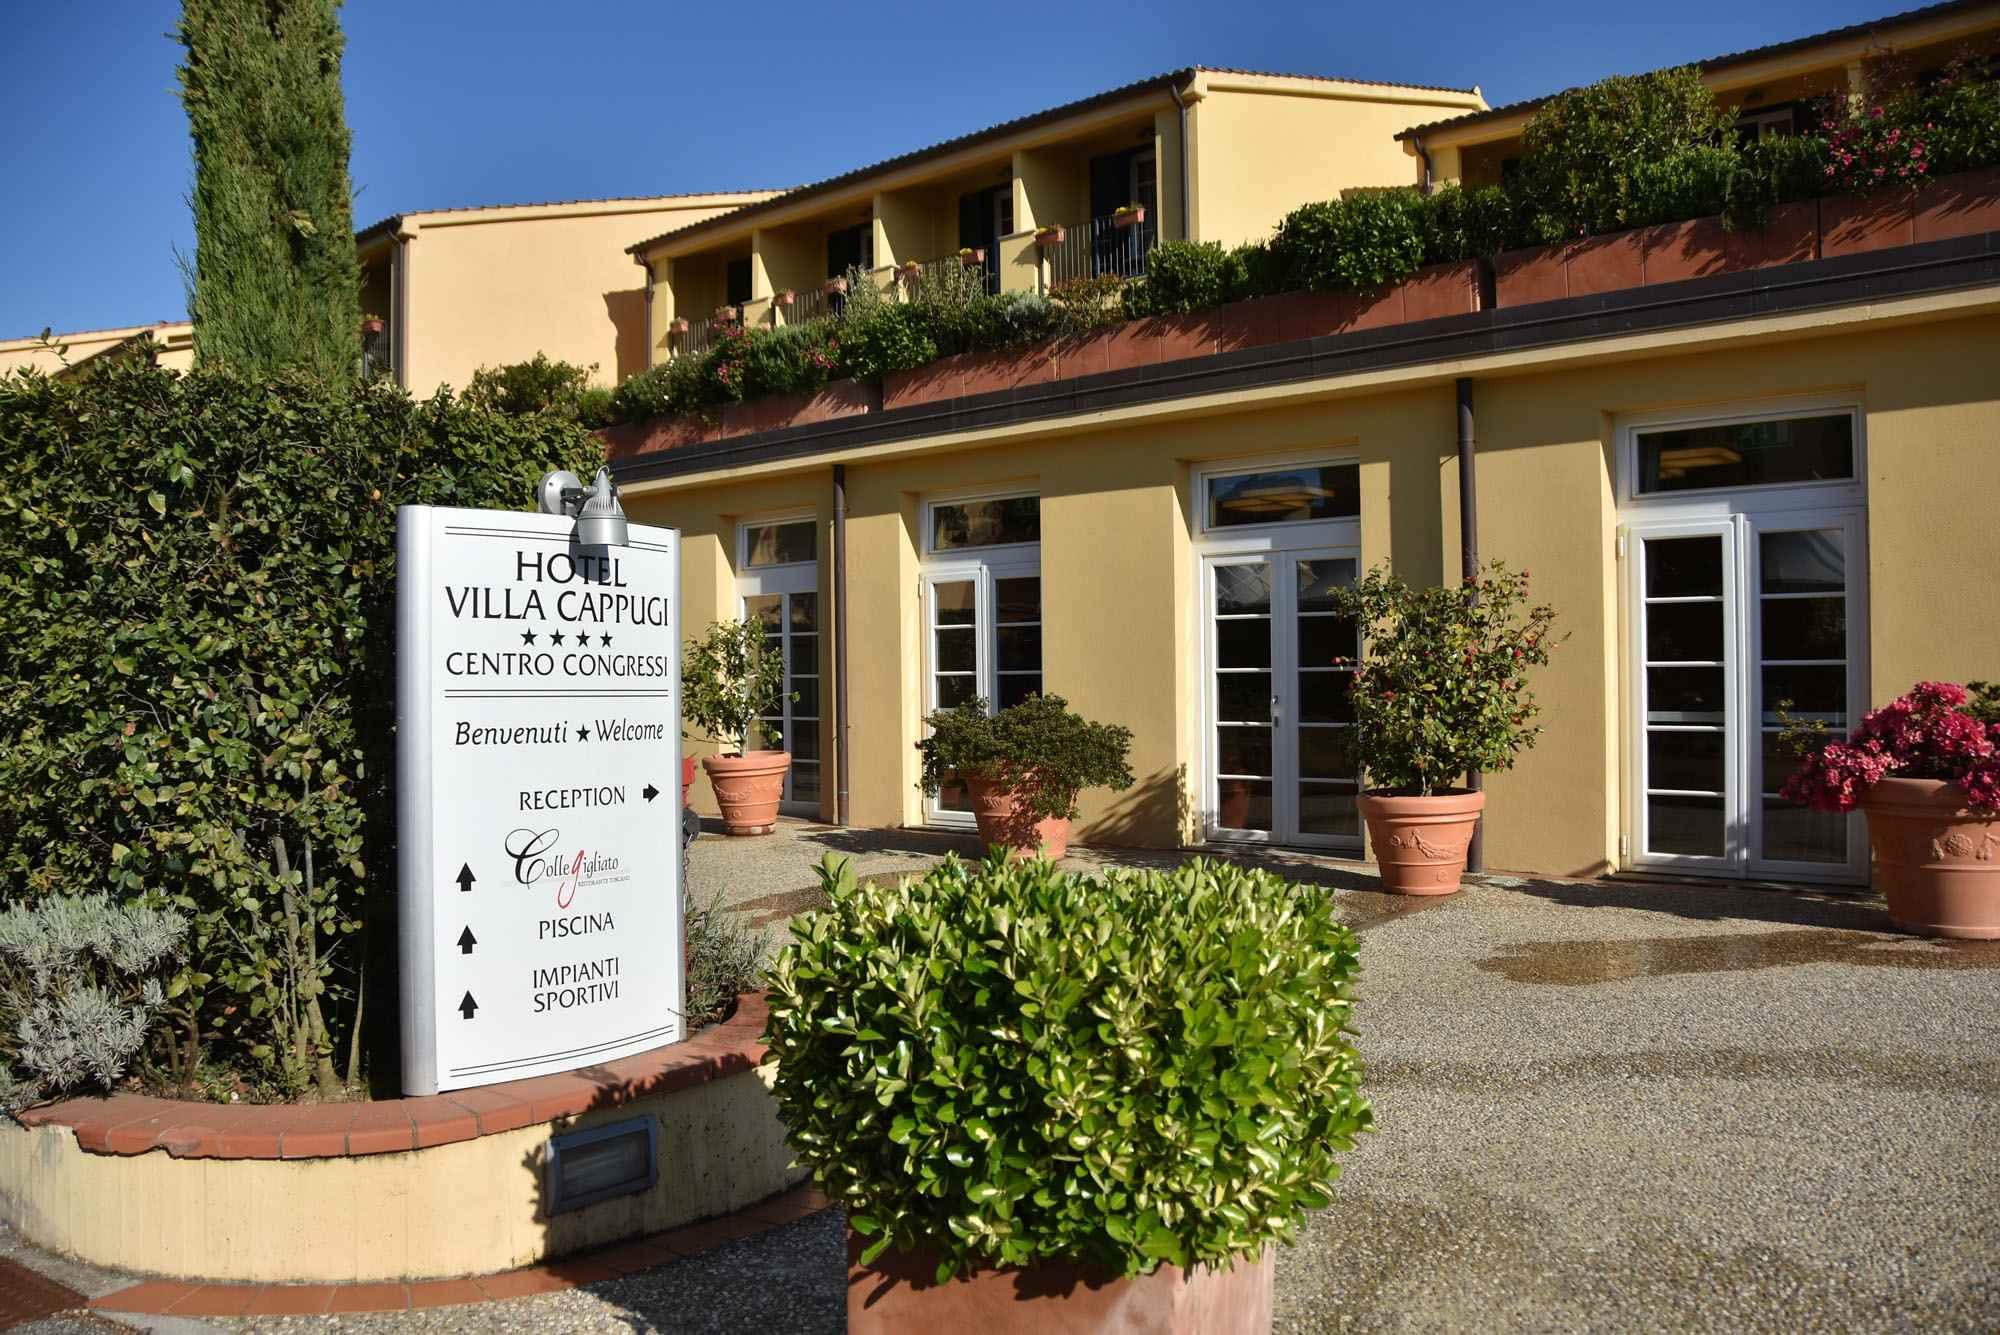 Hotel Villa Cappugi Pistoia Pt Official Reservation